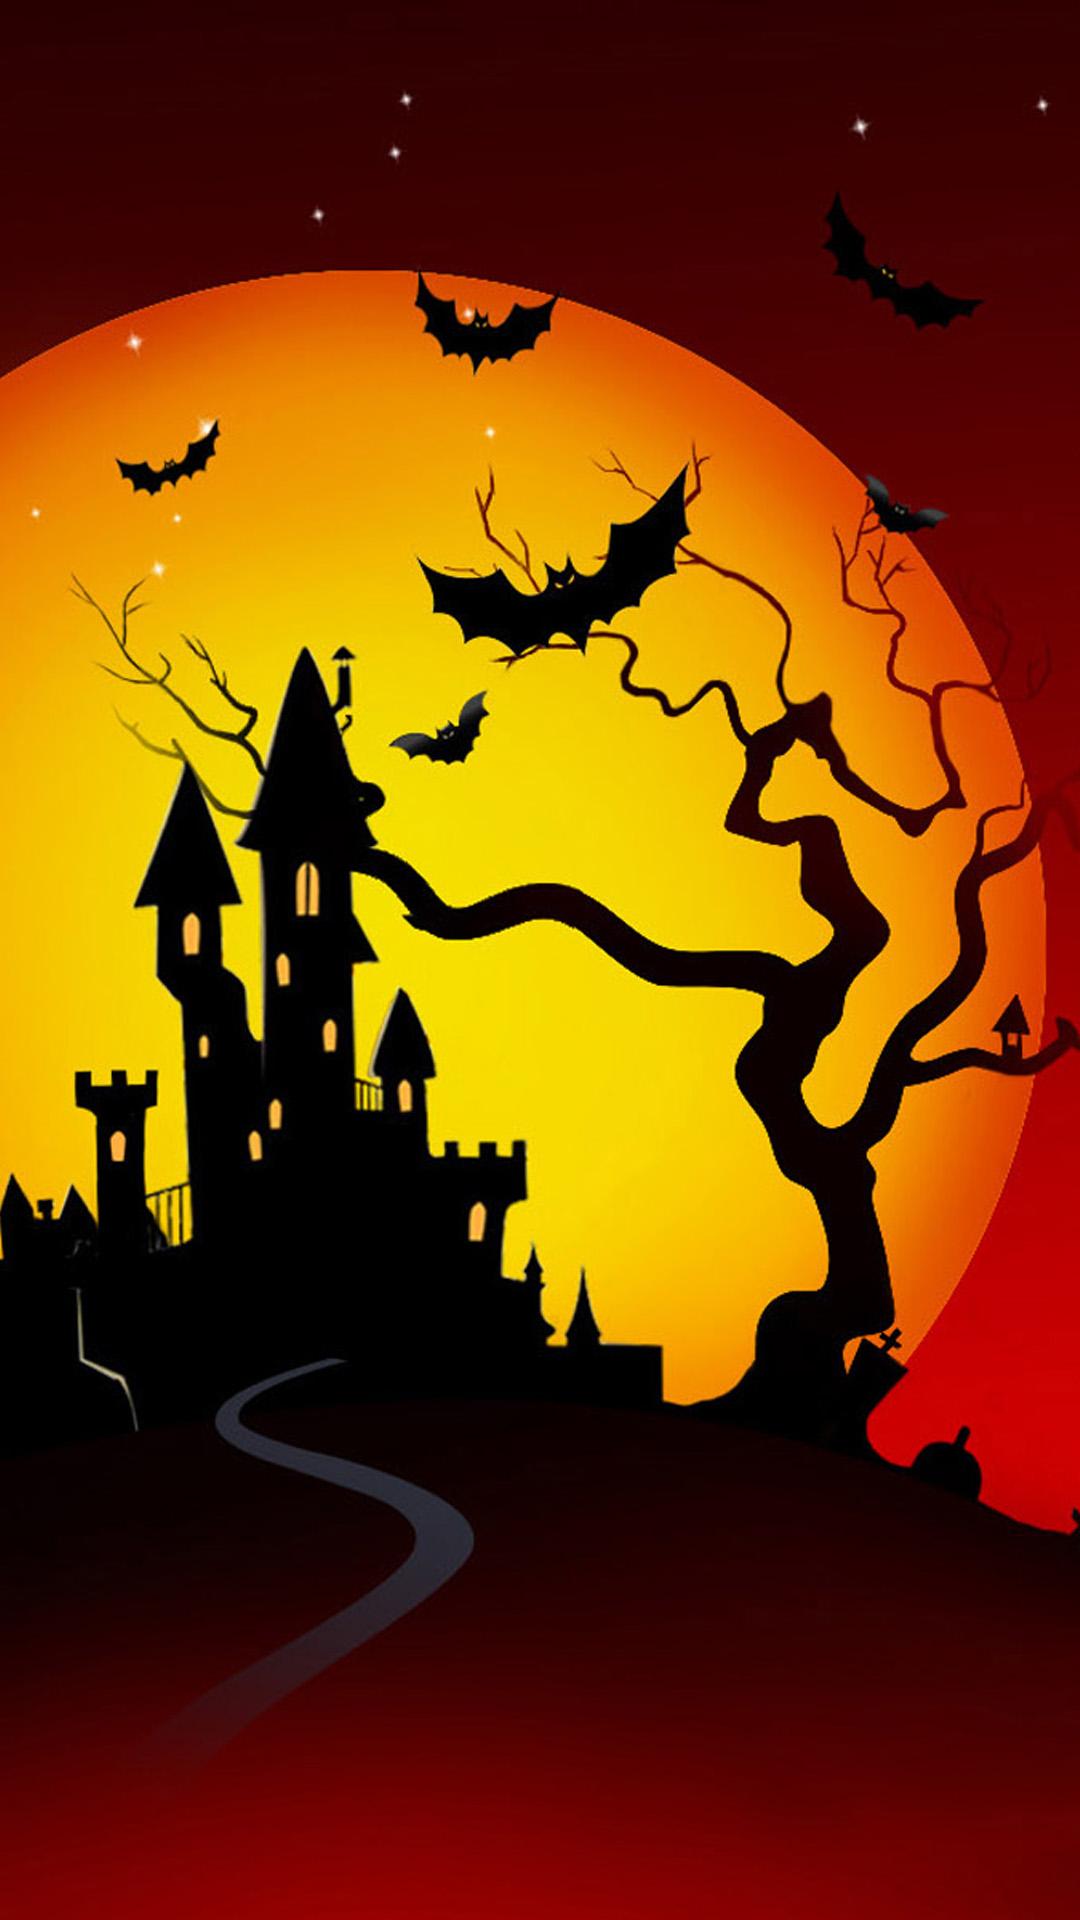 Halloween Wallpaper for iPhone 6 - WallpaperSafari